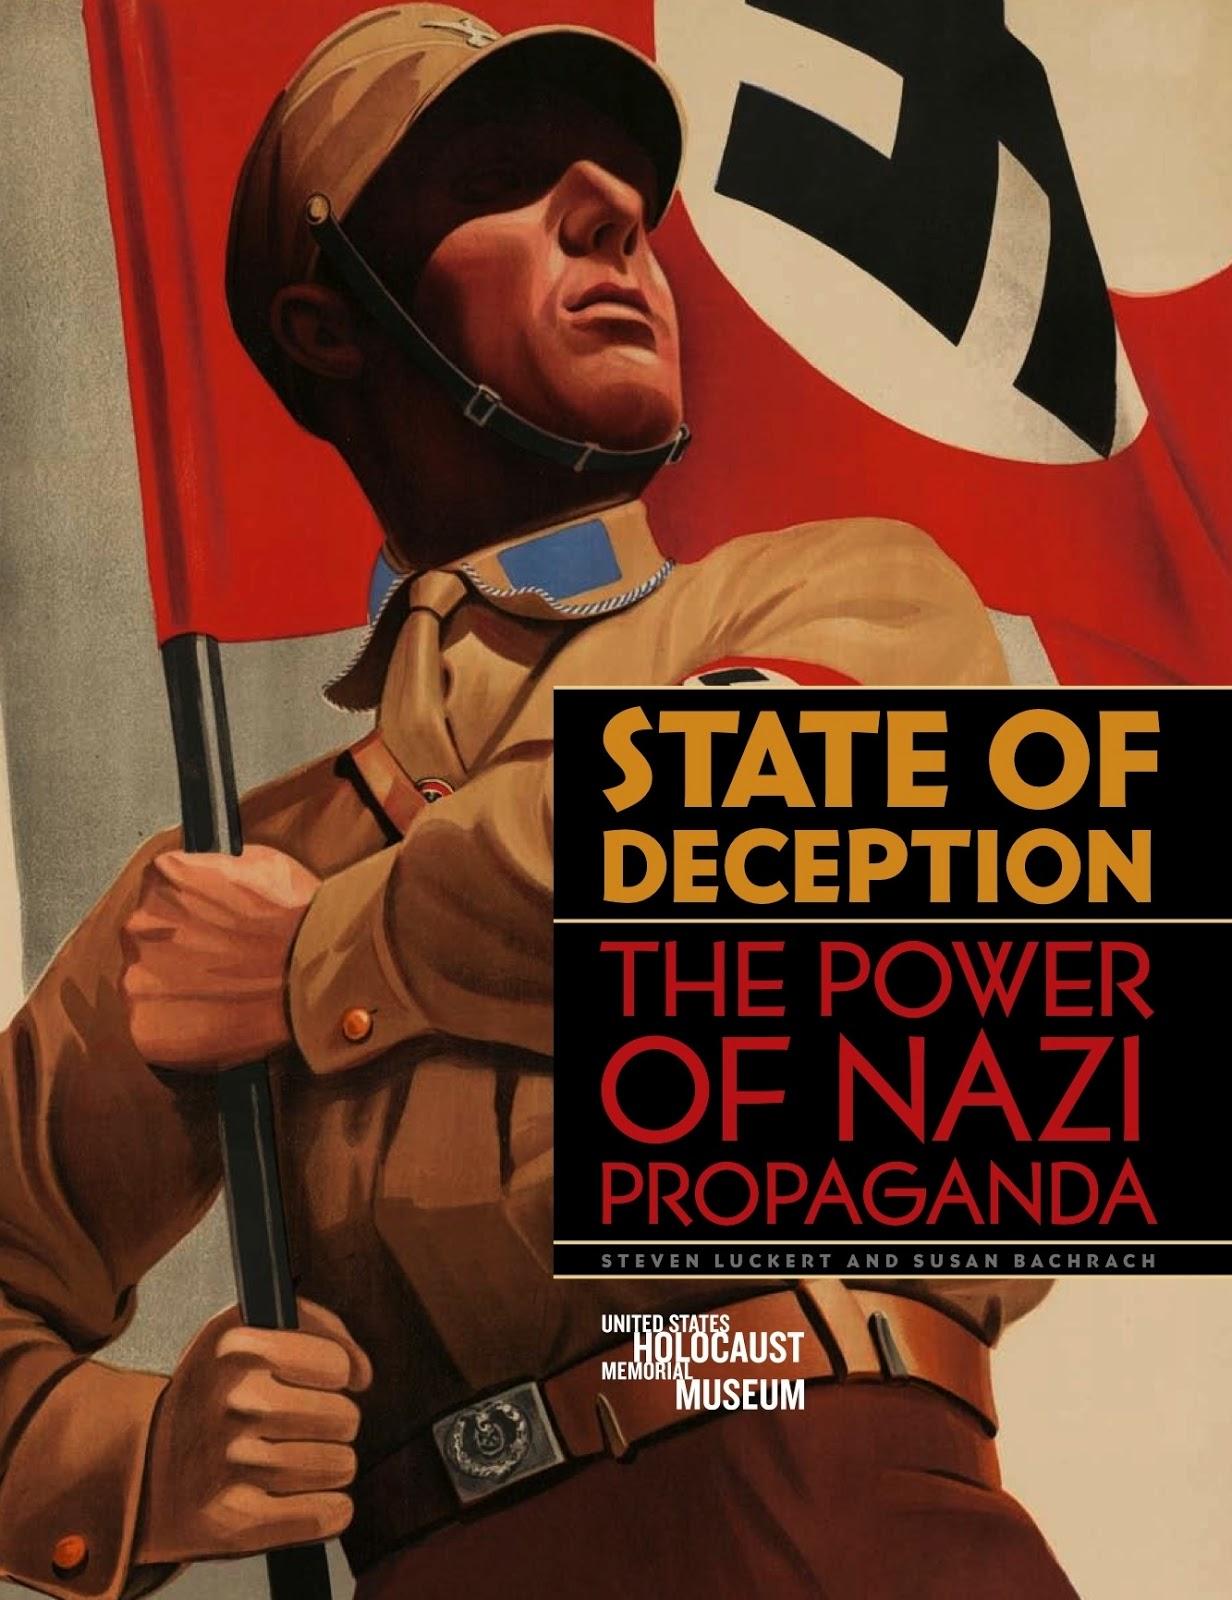 Nazi propaganda D20